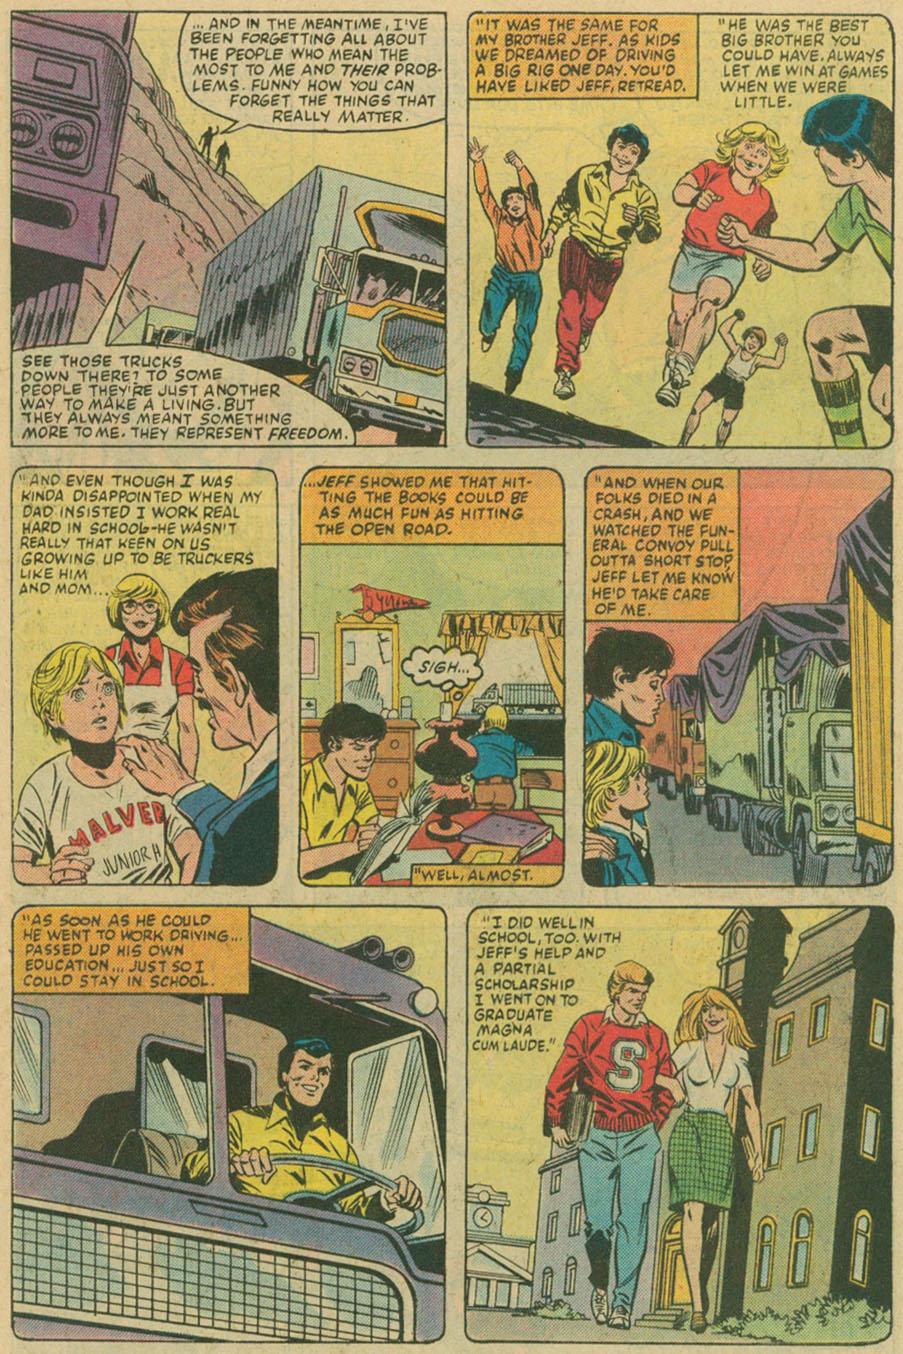 Read online U.S. 1 comic -  Issue #6 - 5